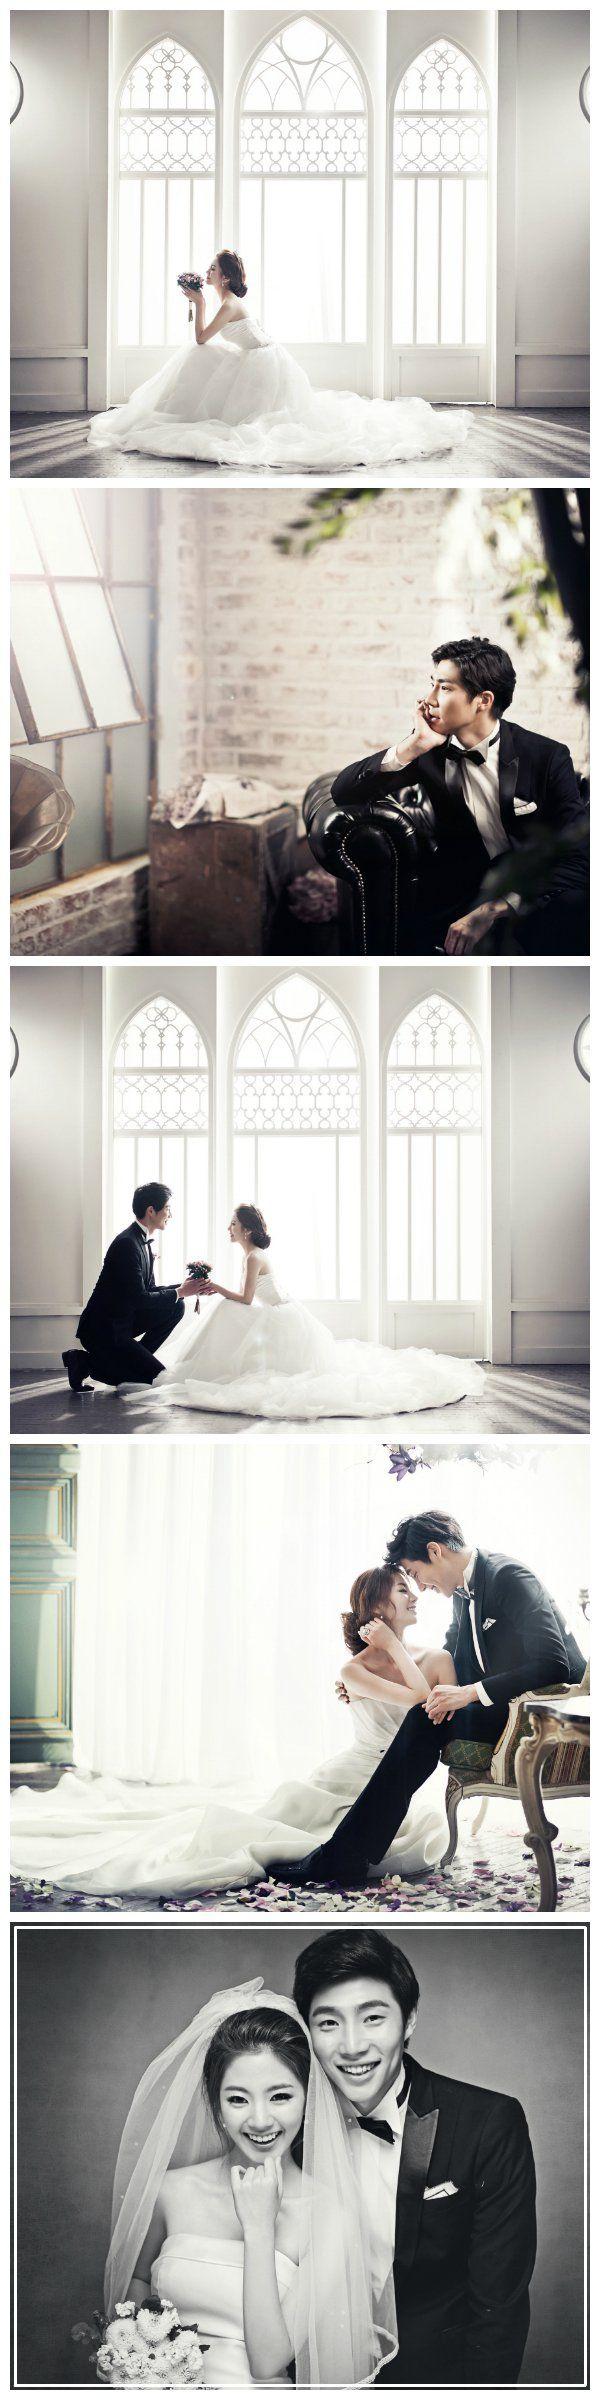 Korean wedding decoration ideas  david cris capstonecompute on Pinterest